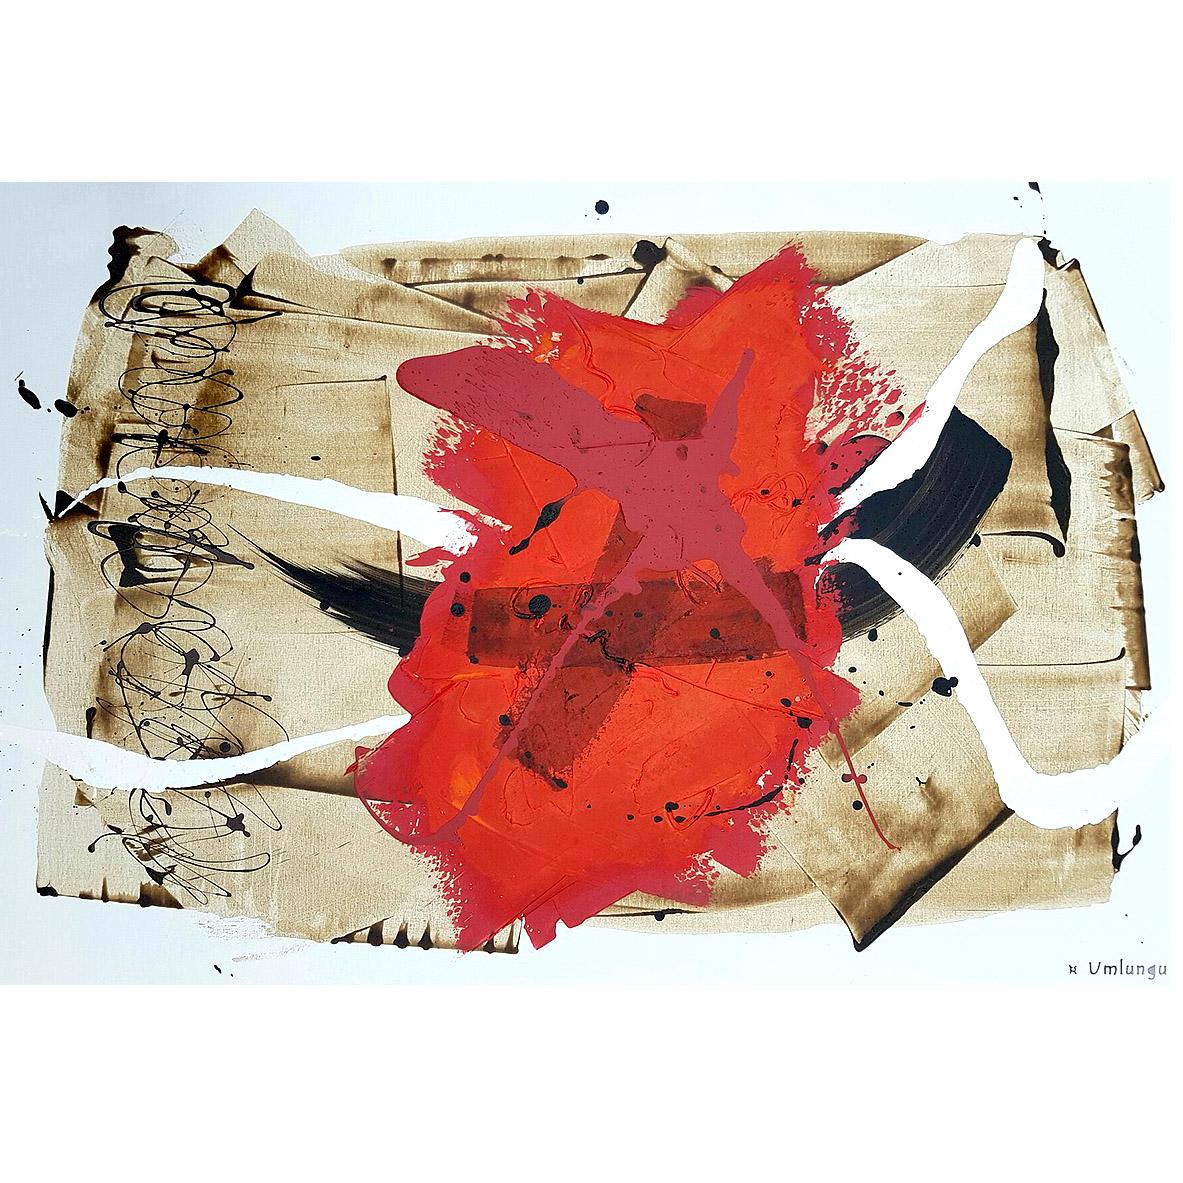 Umlungu, 'I Am Not a Conformist', mixed media on canvas